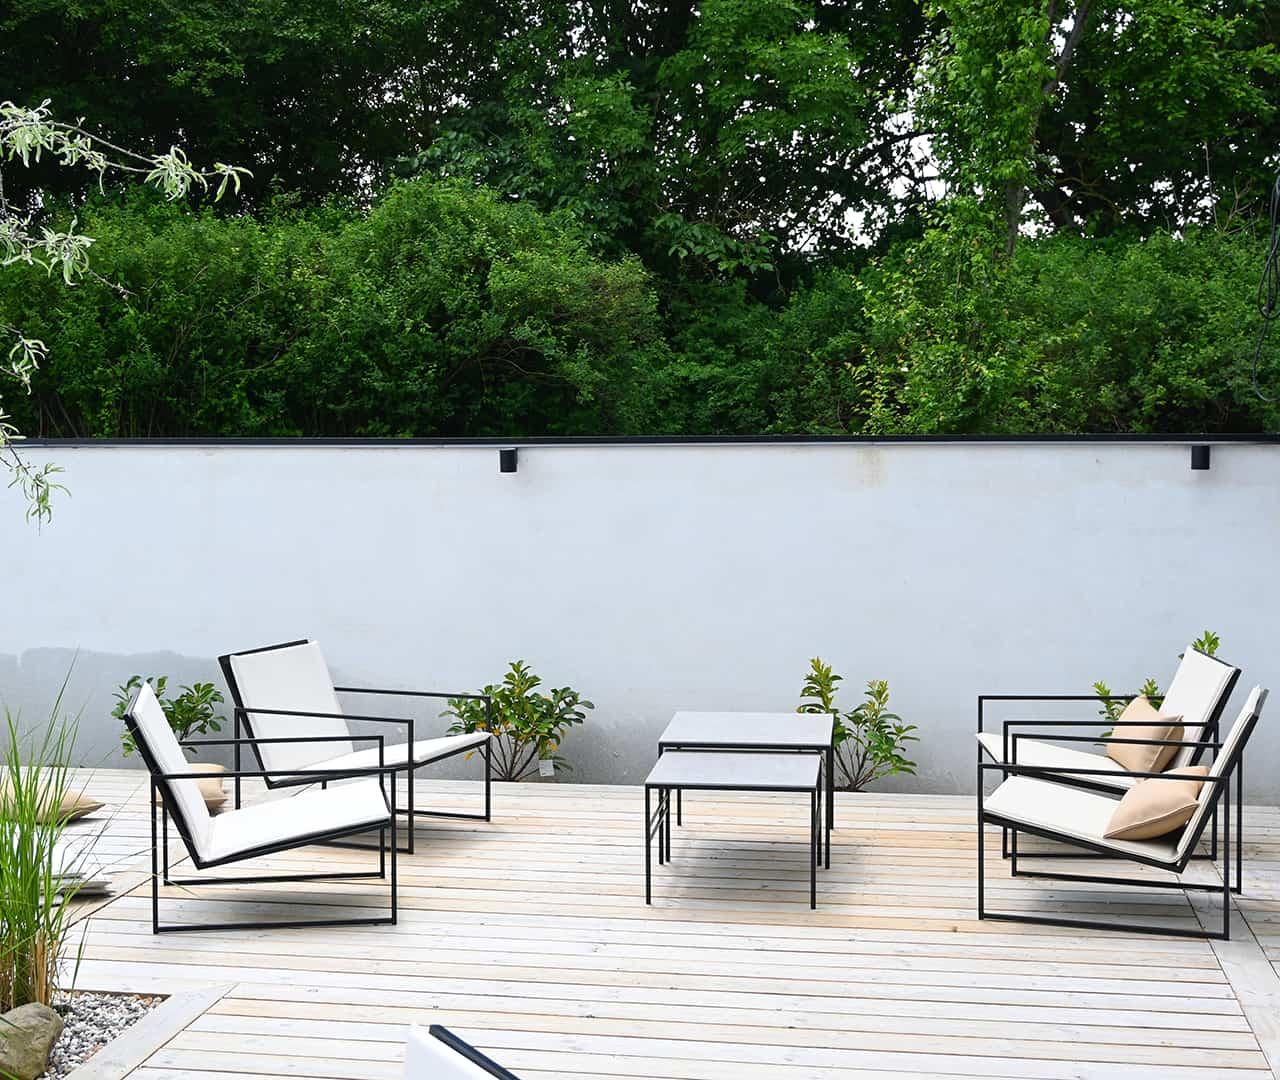 Utomhus kollektion - utemöbler - utestolar - utefåtölj - loungeset utomhus